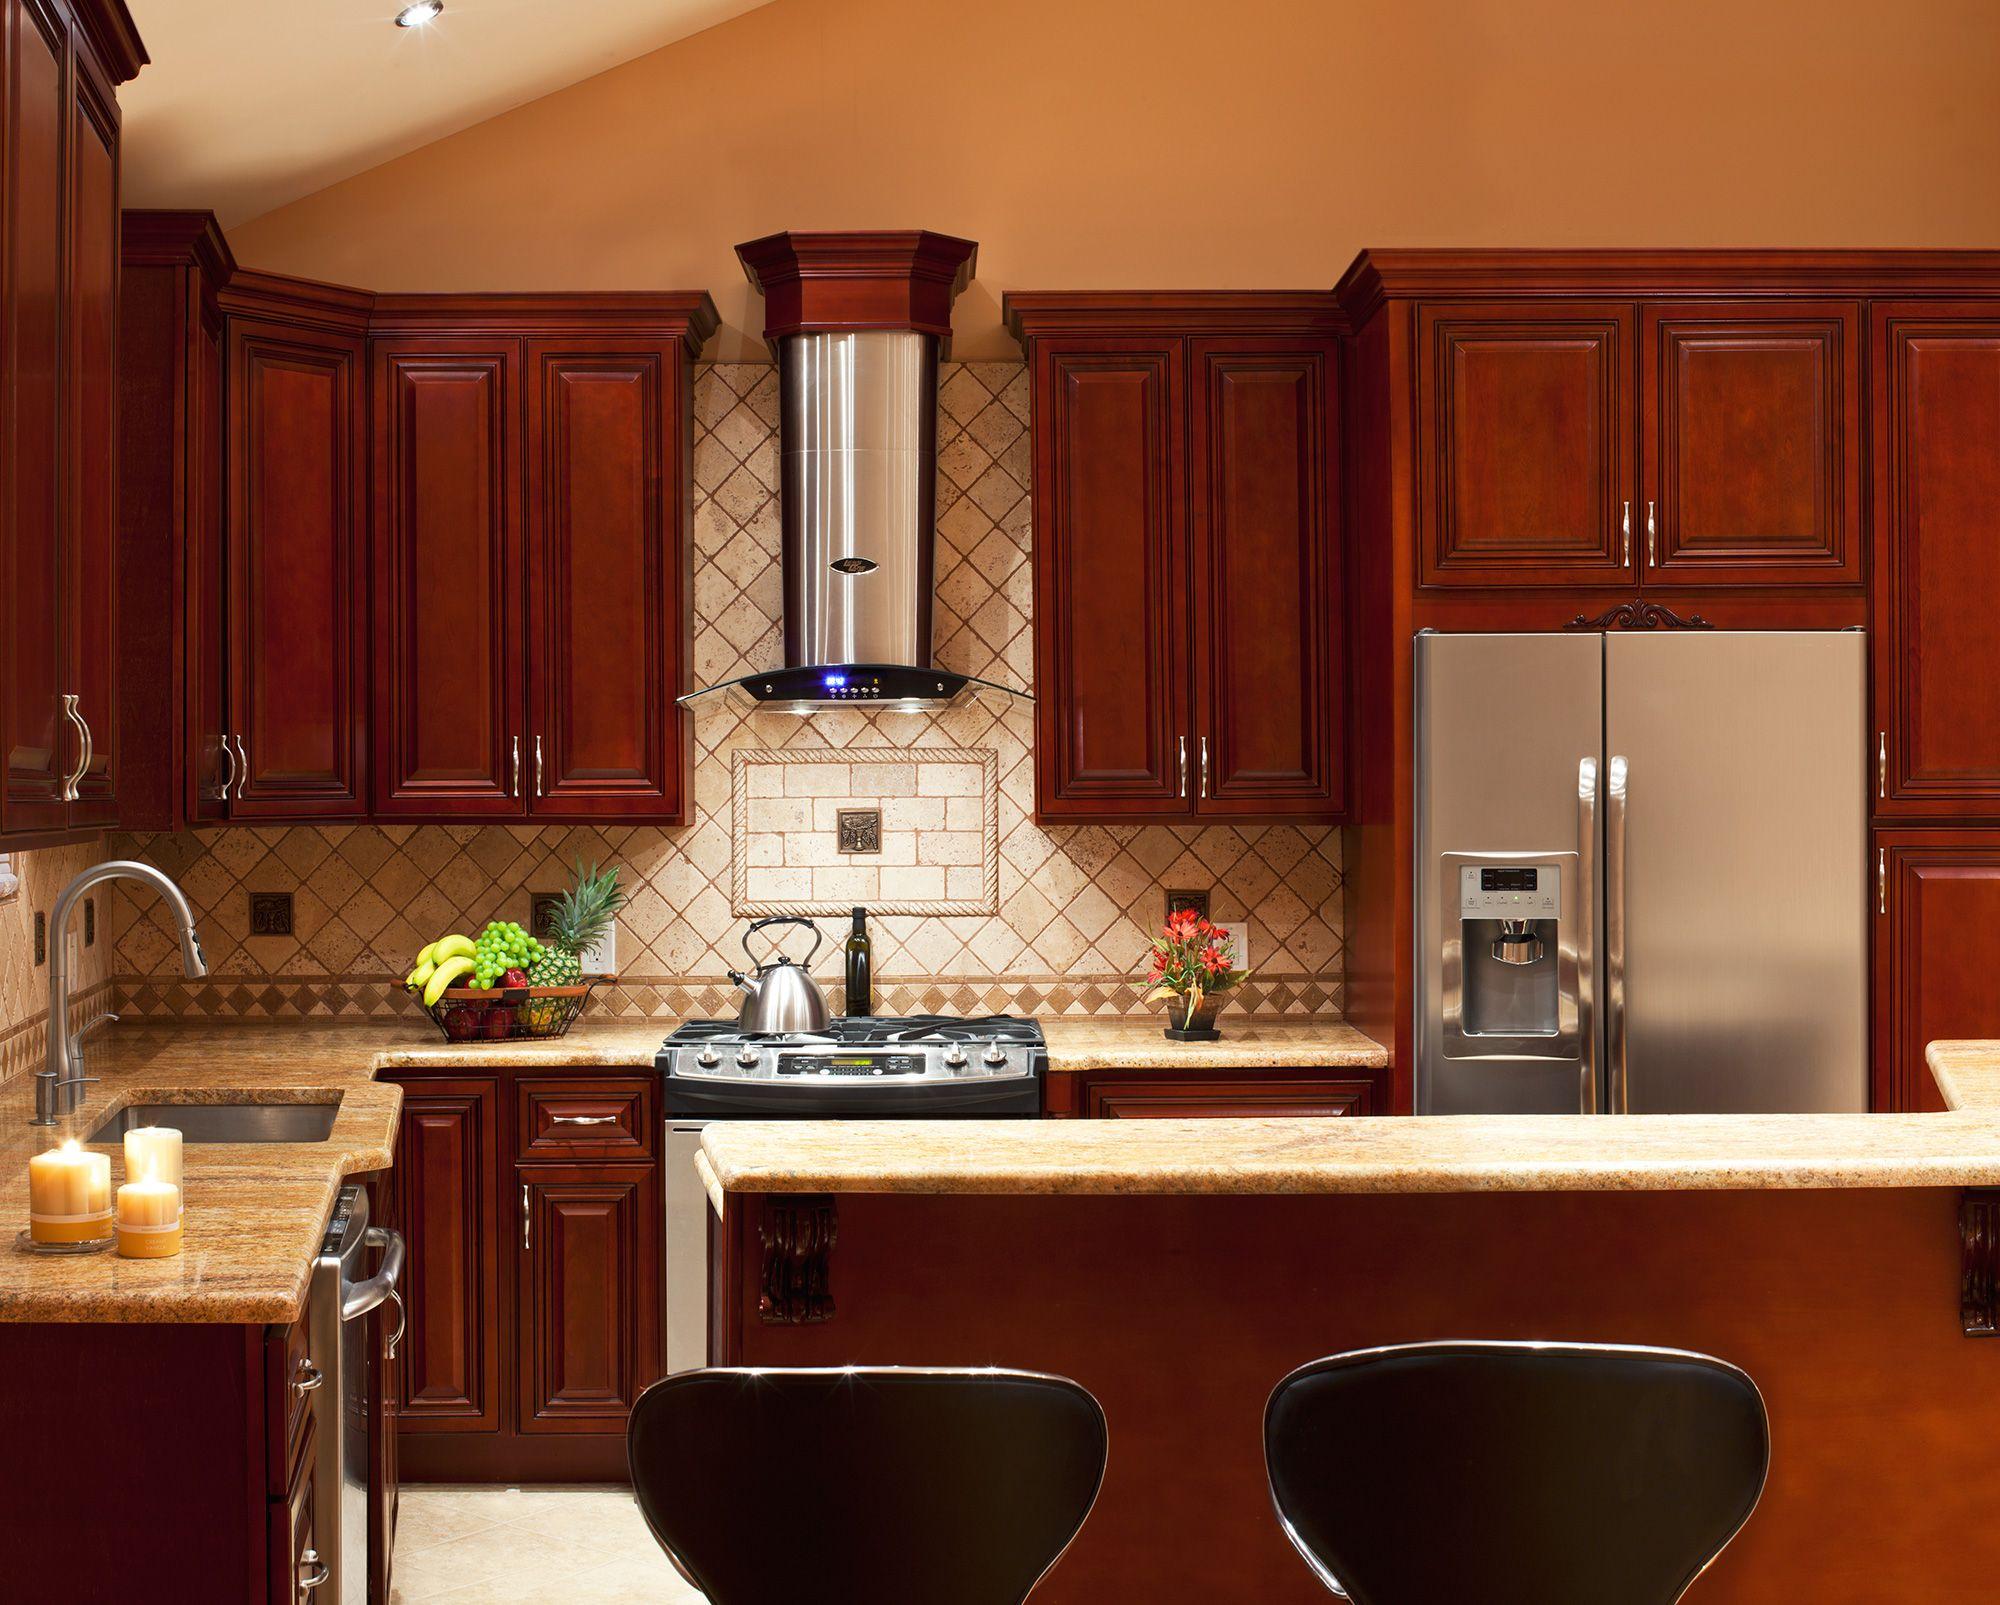 Kitchen Kitchen Floor Ideas With Black Cabinets Kitchen Paint Ideas